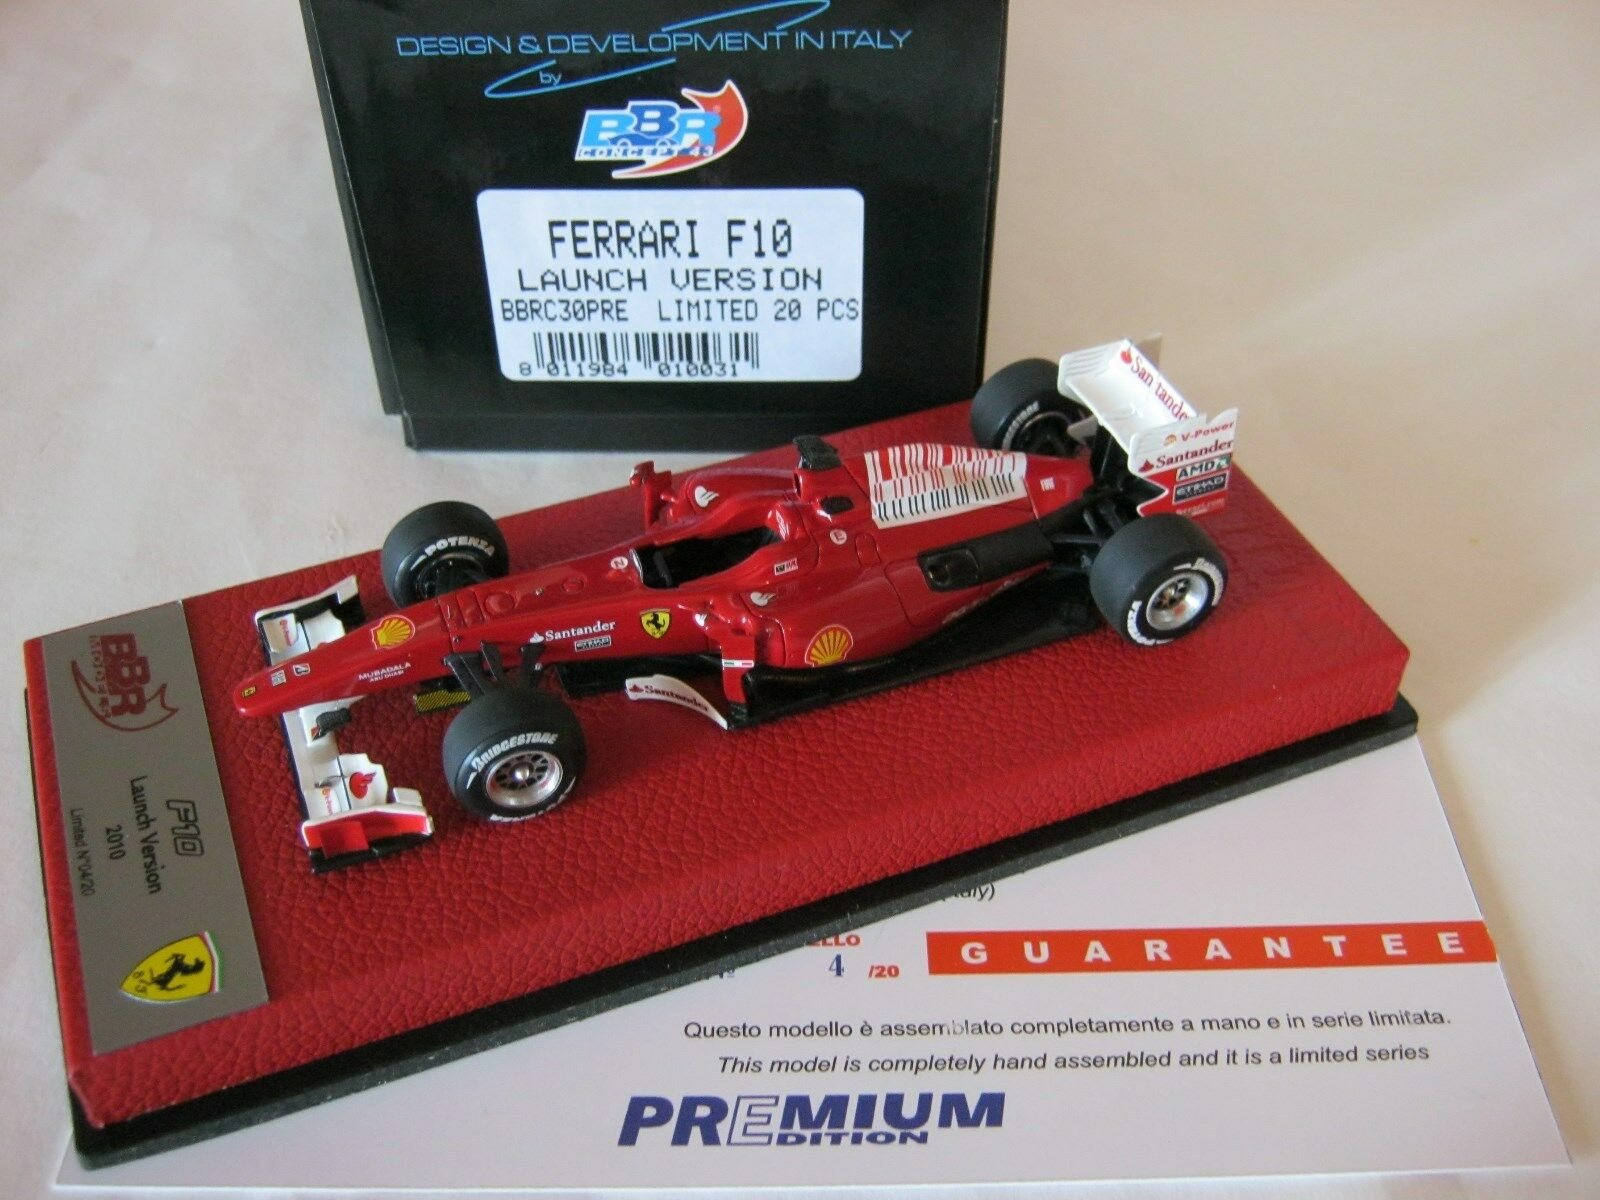 F1 BBR 1 43 FERRARI F10 LAUNCH VERSION 2010 BBR C30PRE